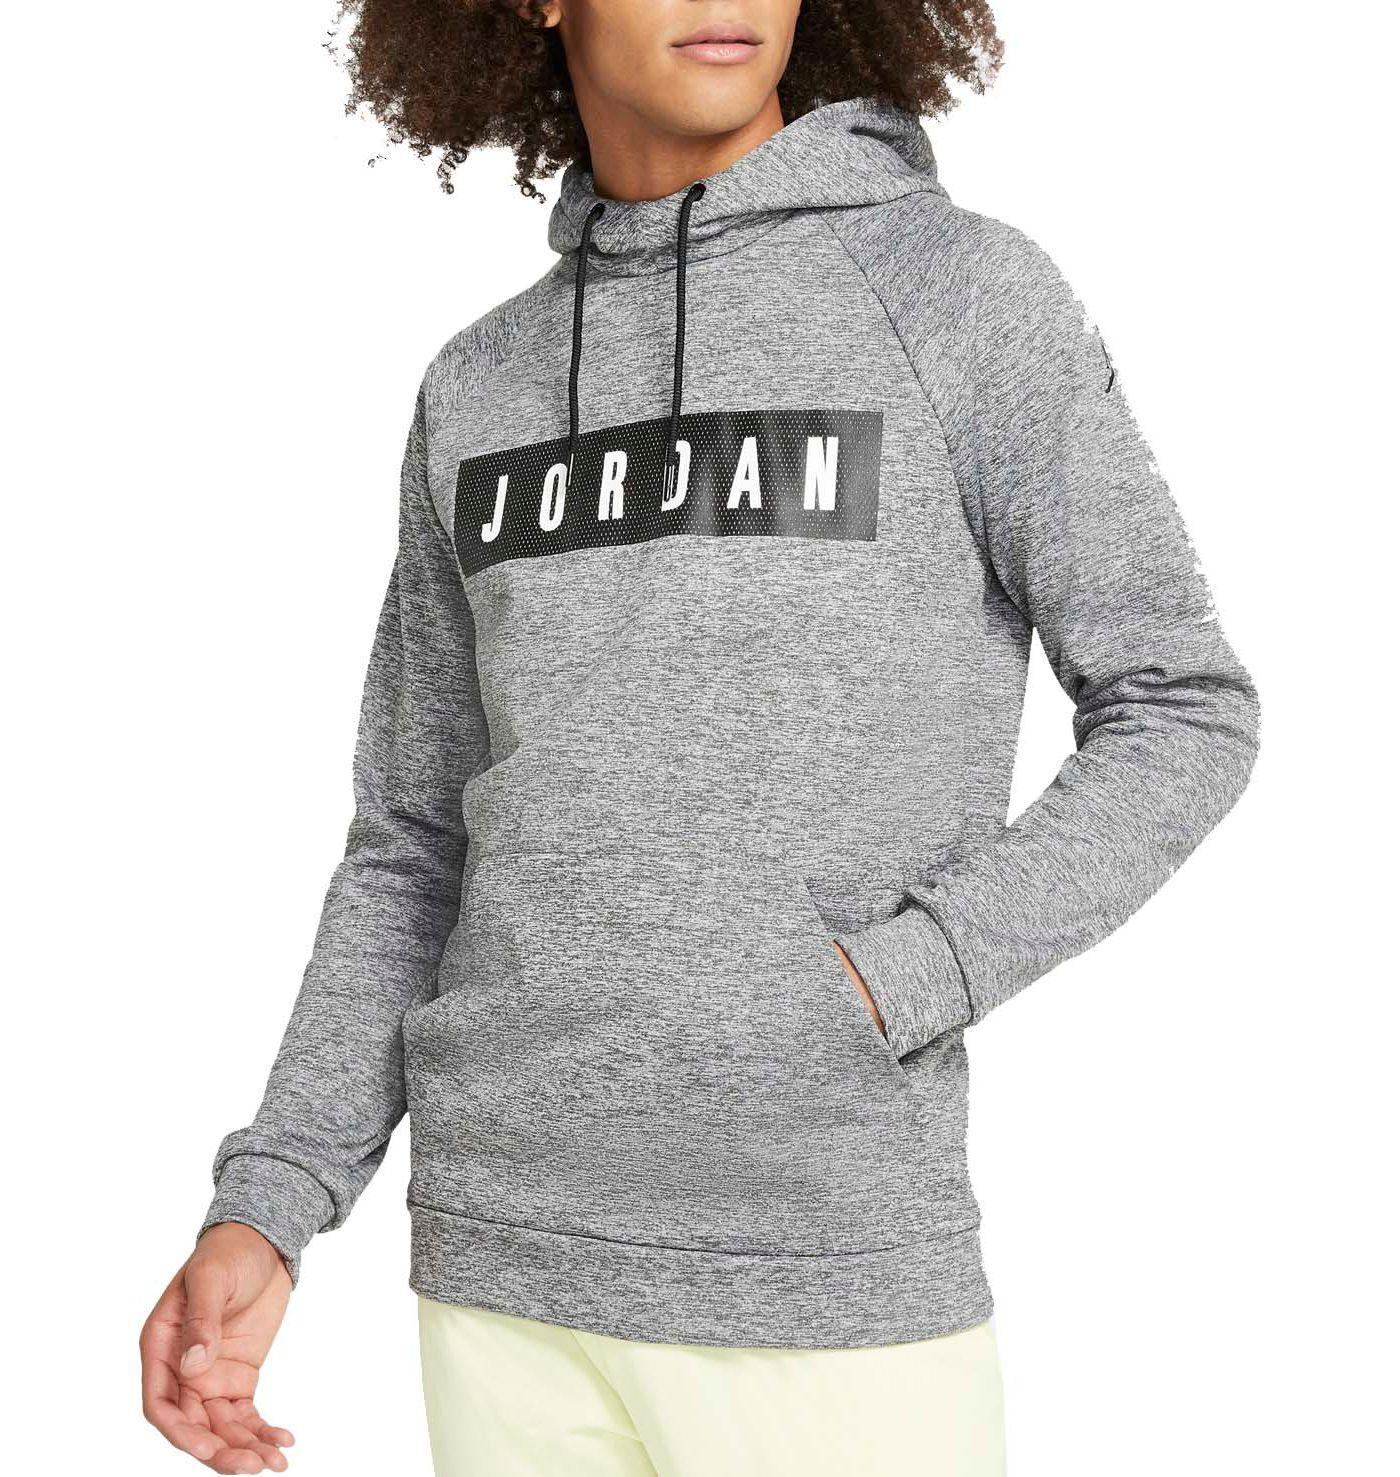 Jordan Men's 23 Alpha Therma Fleece Pullover Basketball Hoodie